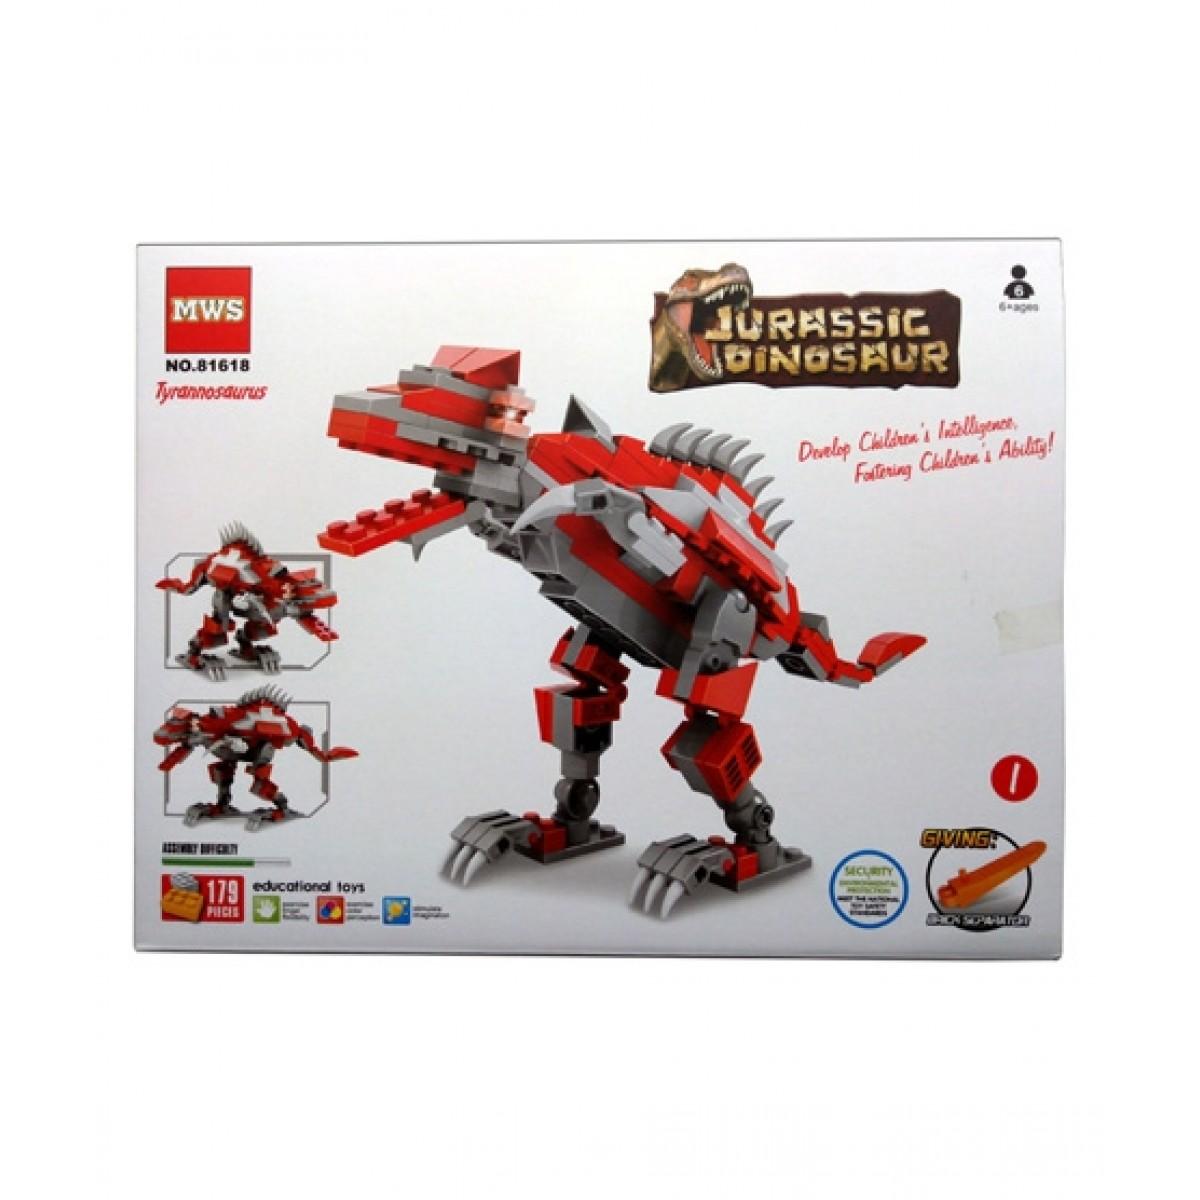 Planet X Jurassic Dinosaur Tyrannosaurus Building Blocks Red (PX-9777)